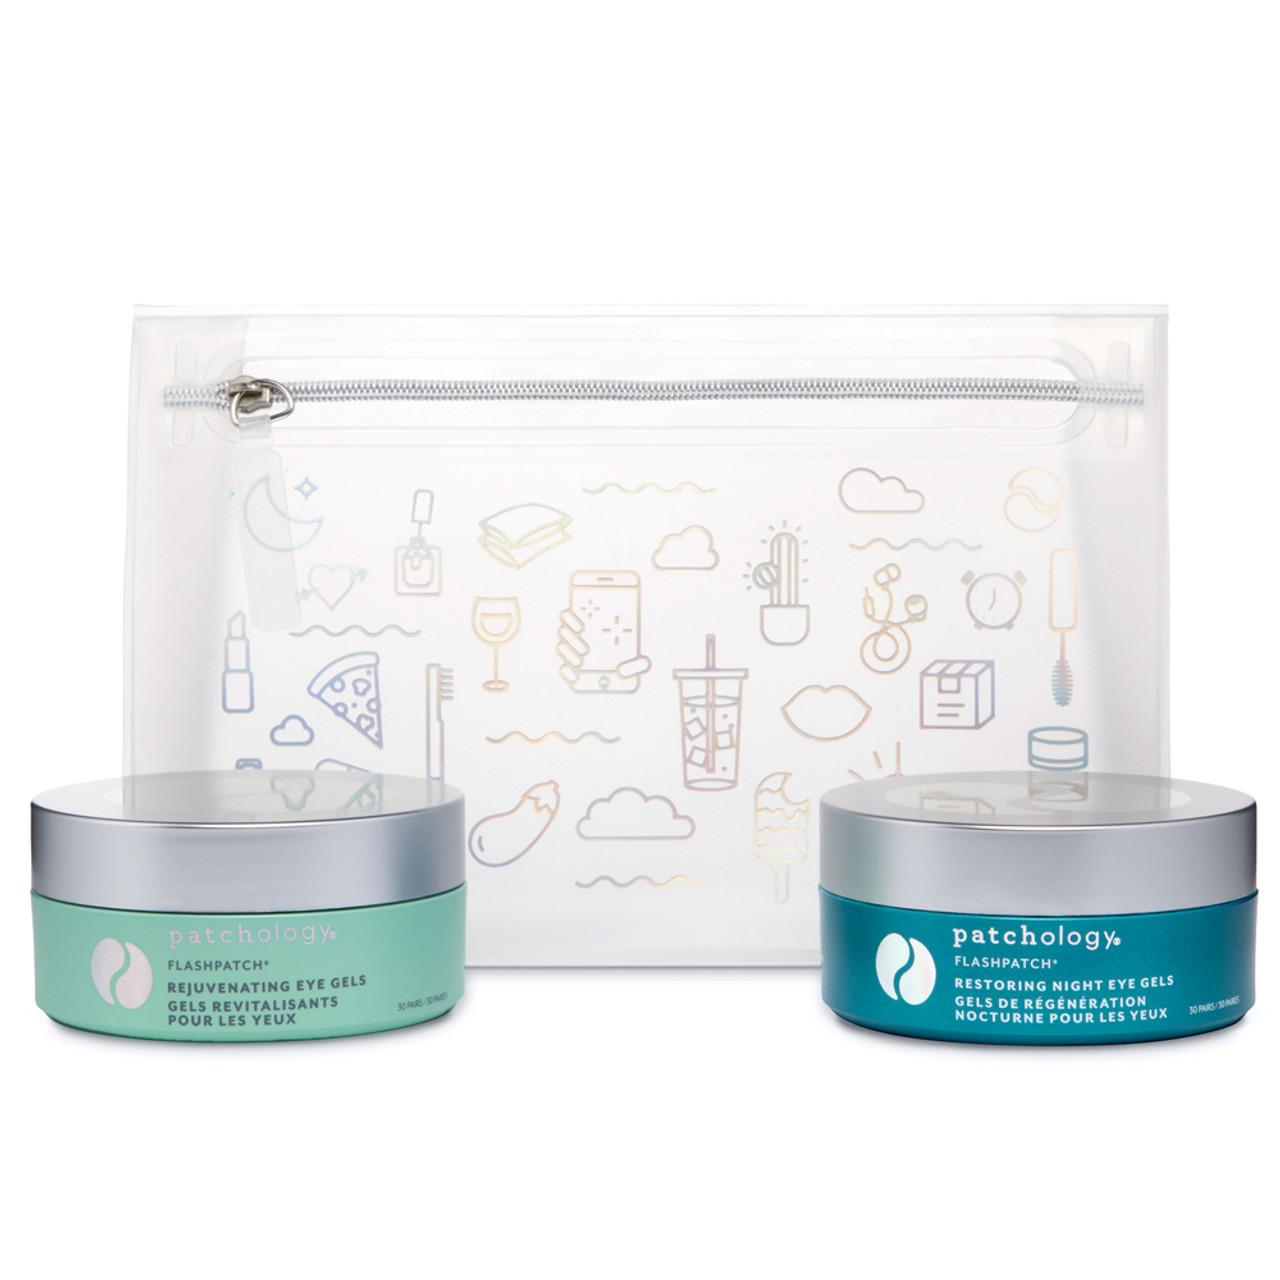 Patchology Night & Day Miracle Eye Duo Kit